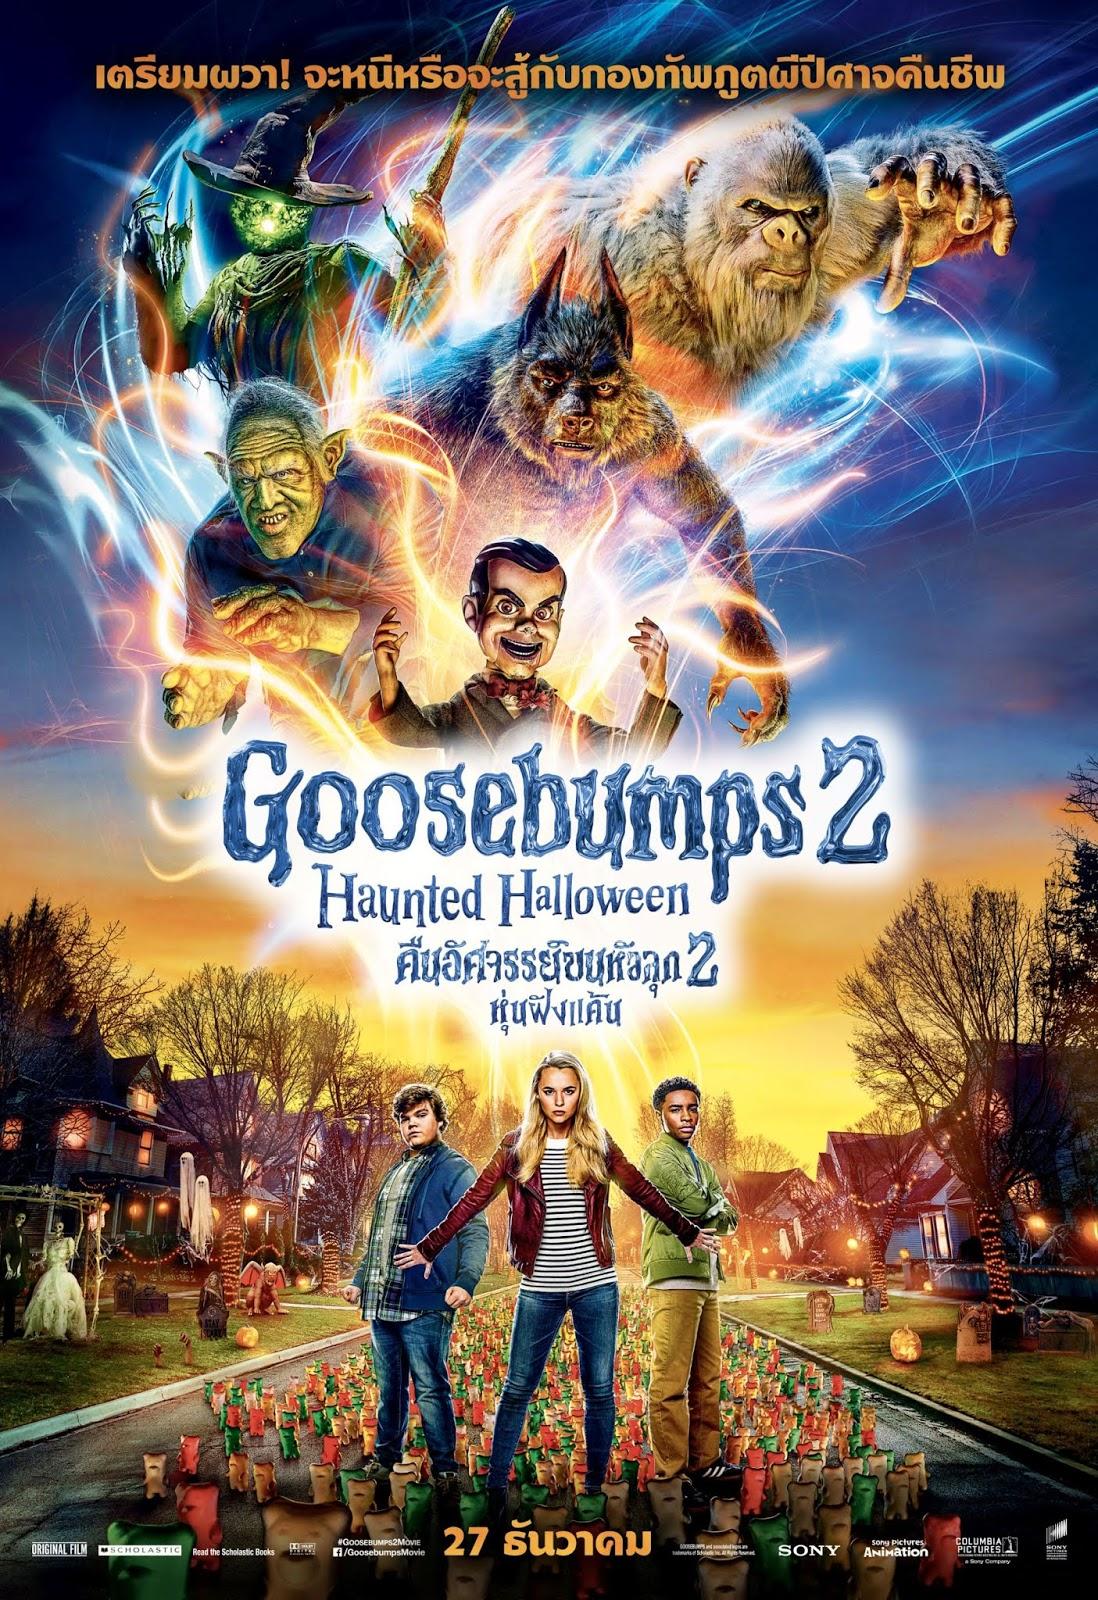 Goosebumps 2: Haunted Halloween (2018) คืนอัศจรรย์ขนหัวลุก 2: หุ่นฝังแค้น